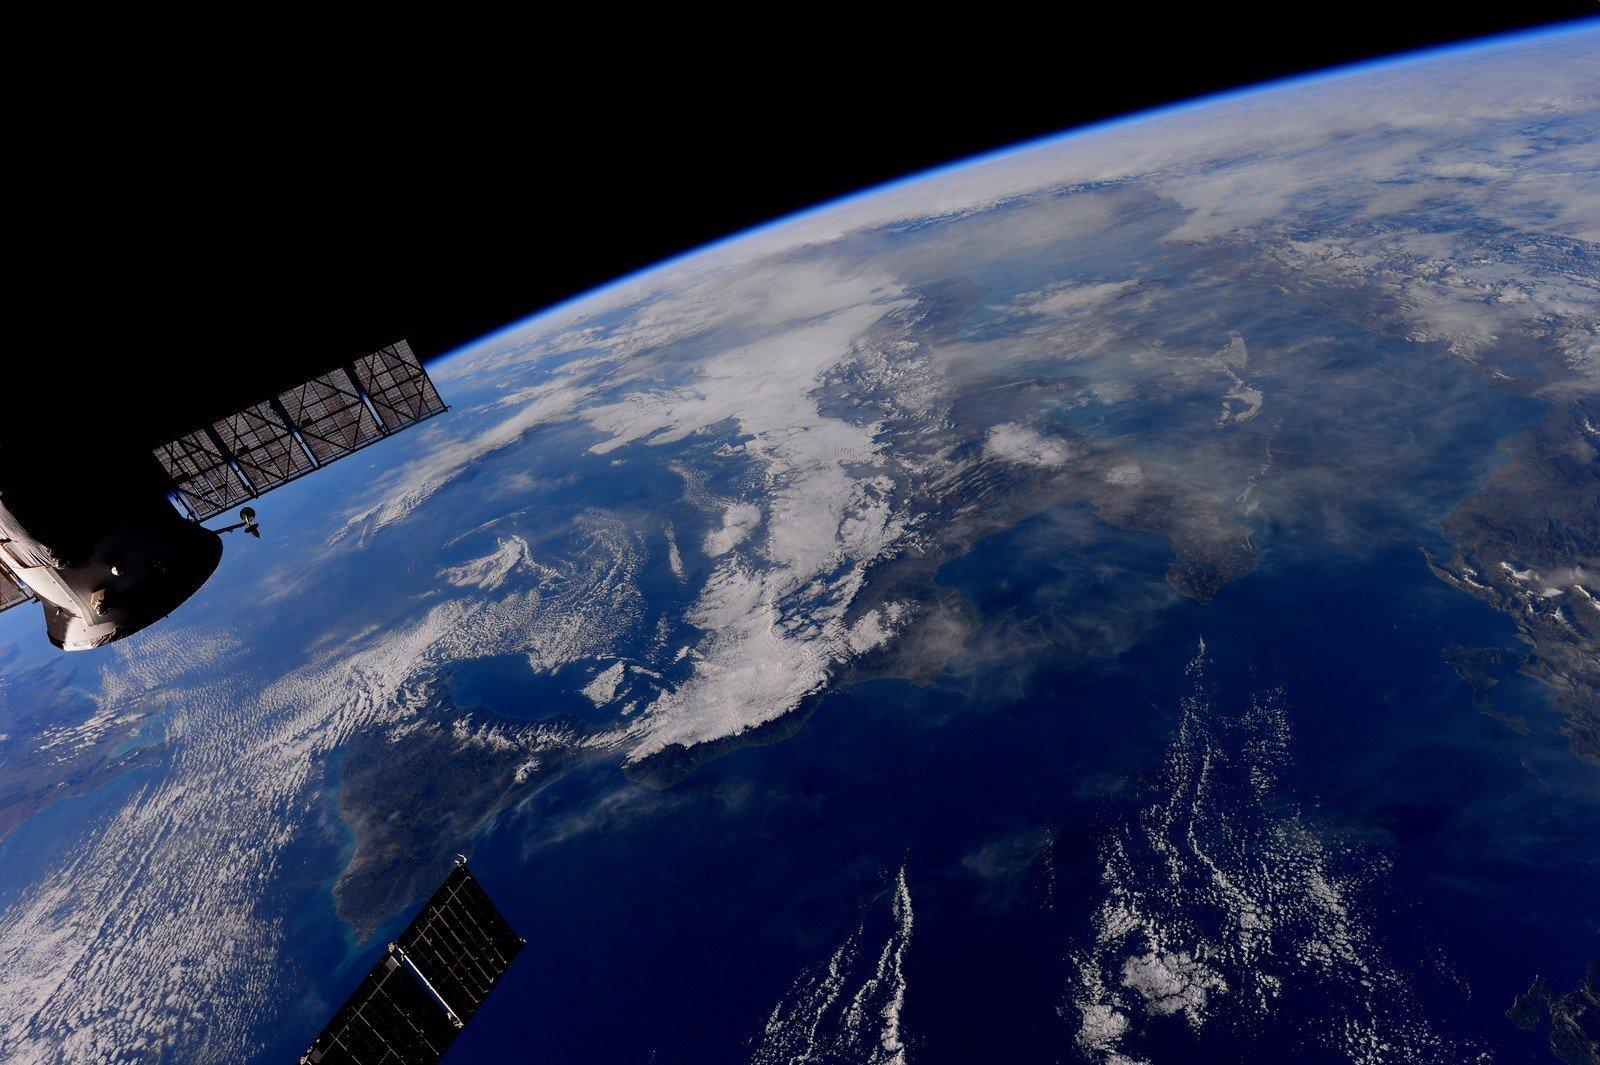 снимок земли из космоса картинка